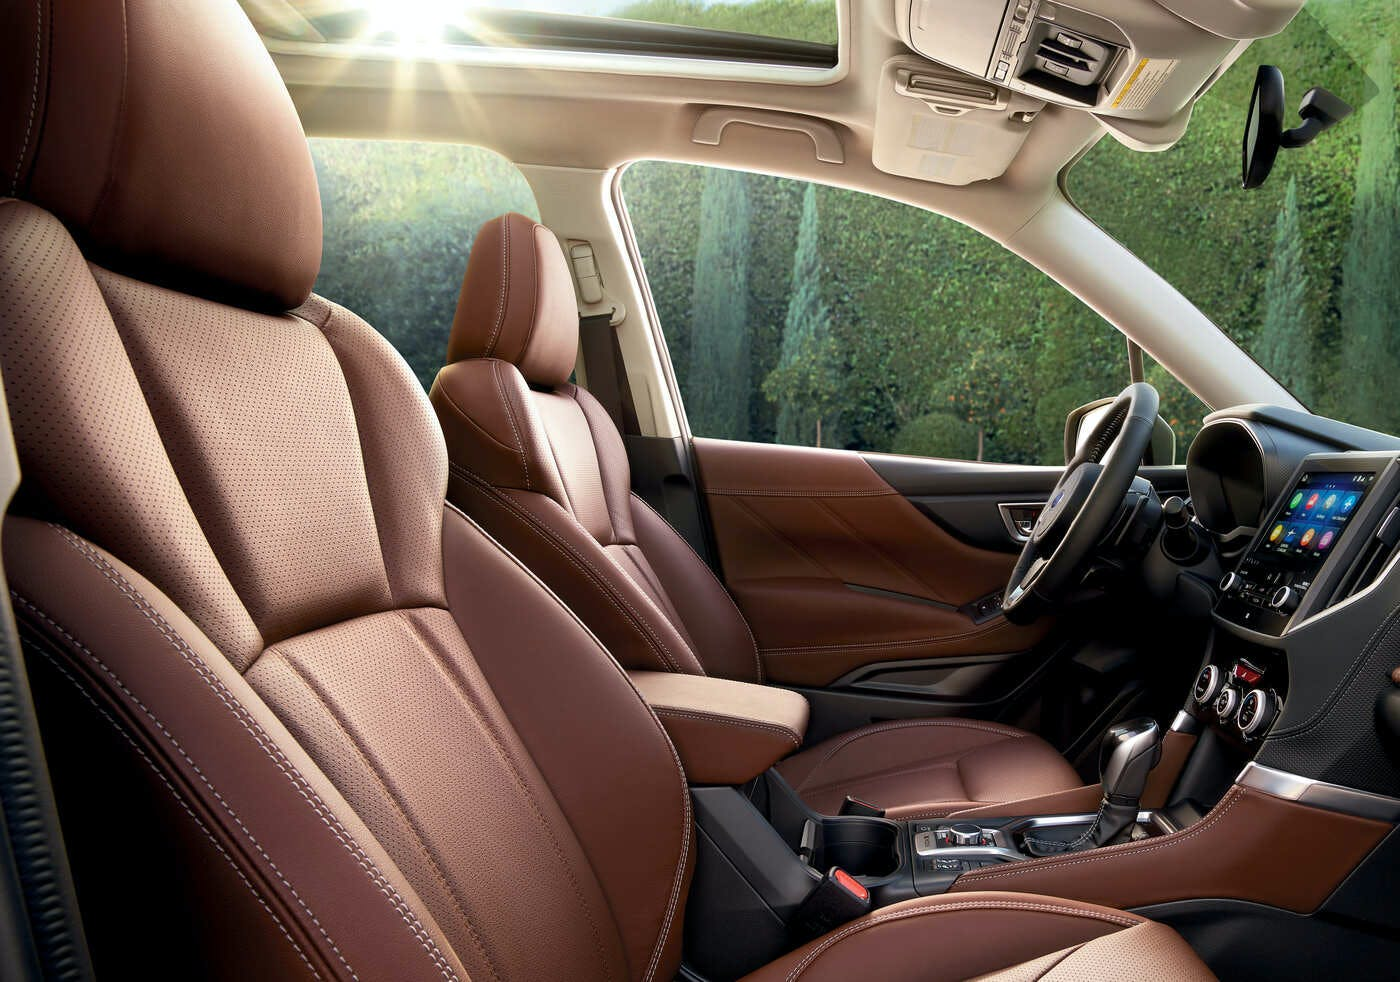 2019 Subaru Forester Comparisons, Reviews & Pictures   TrueCar